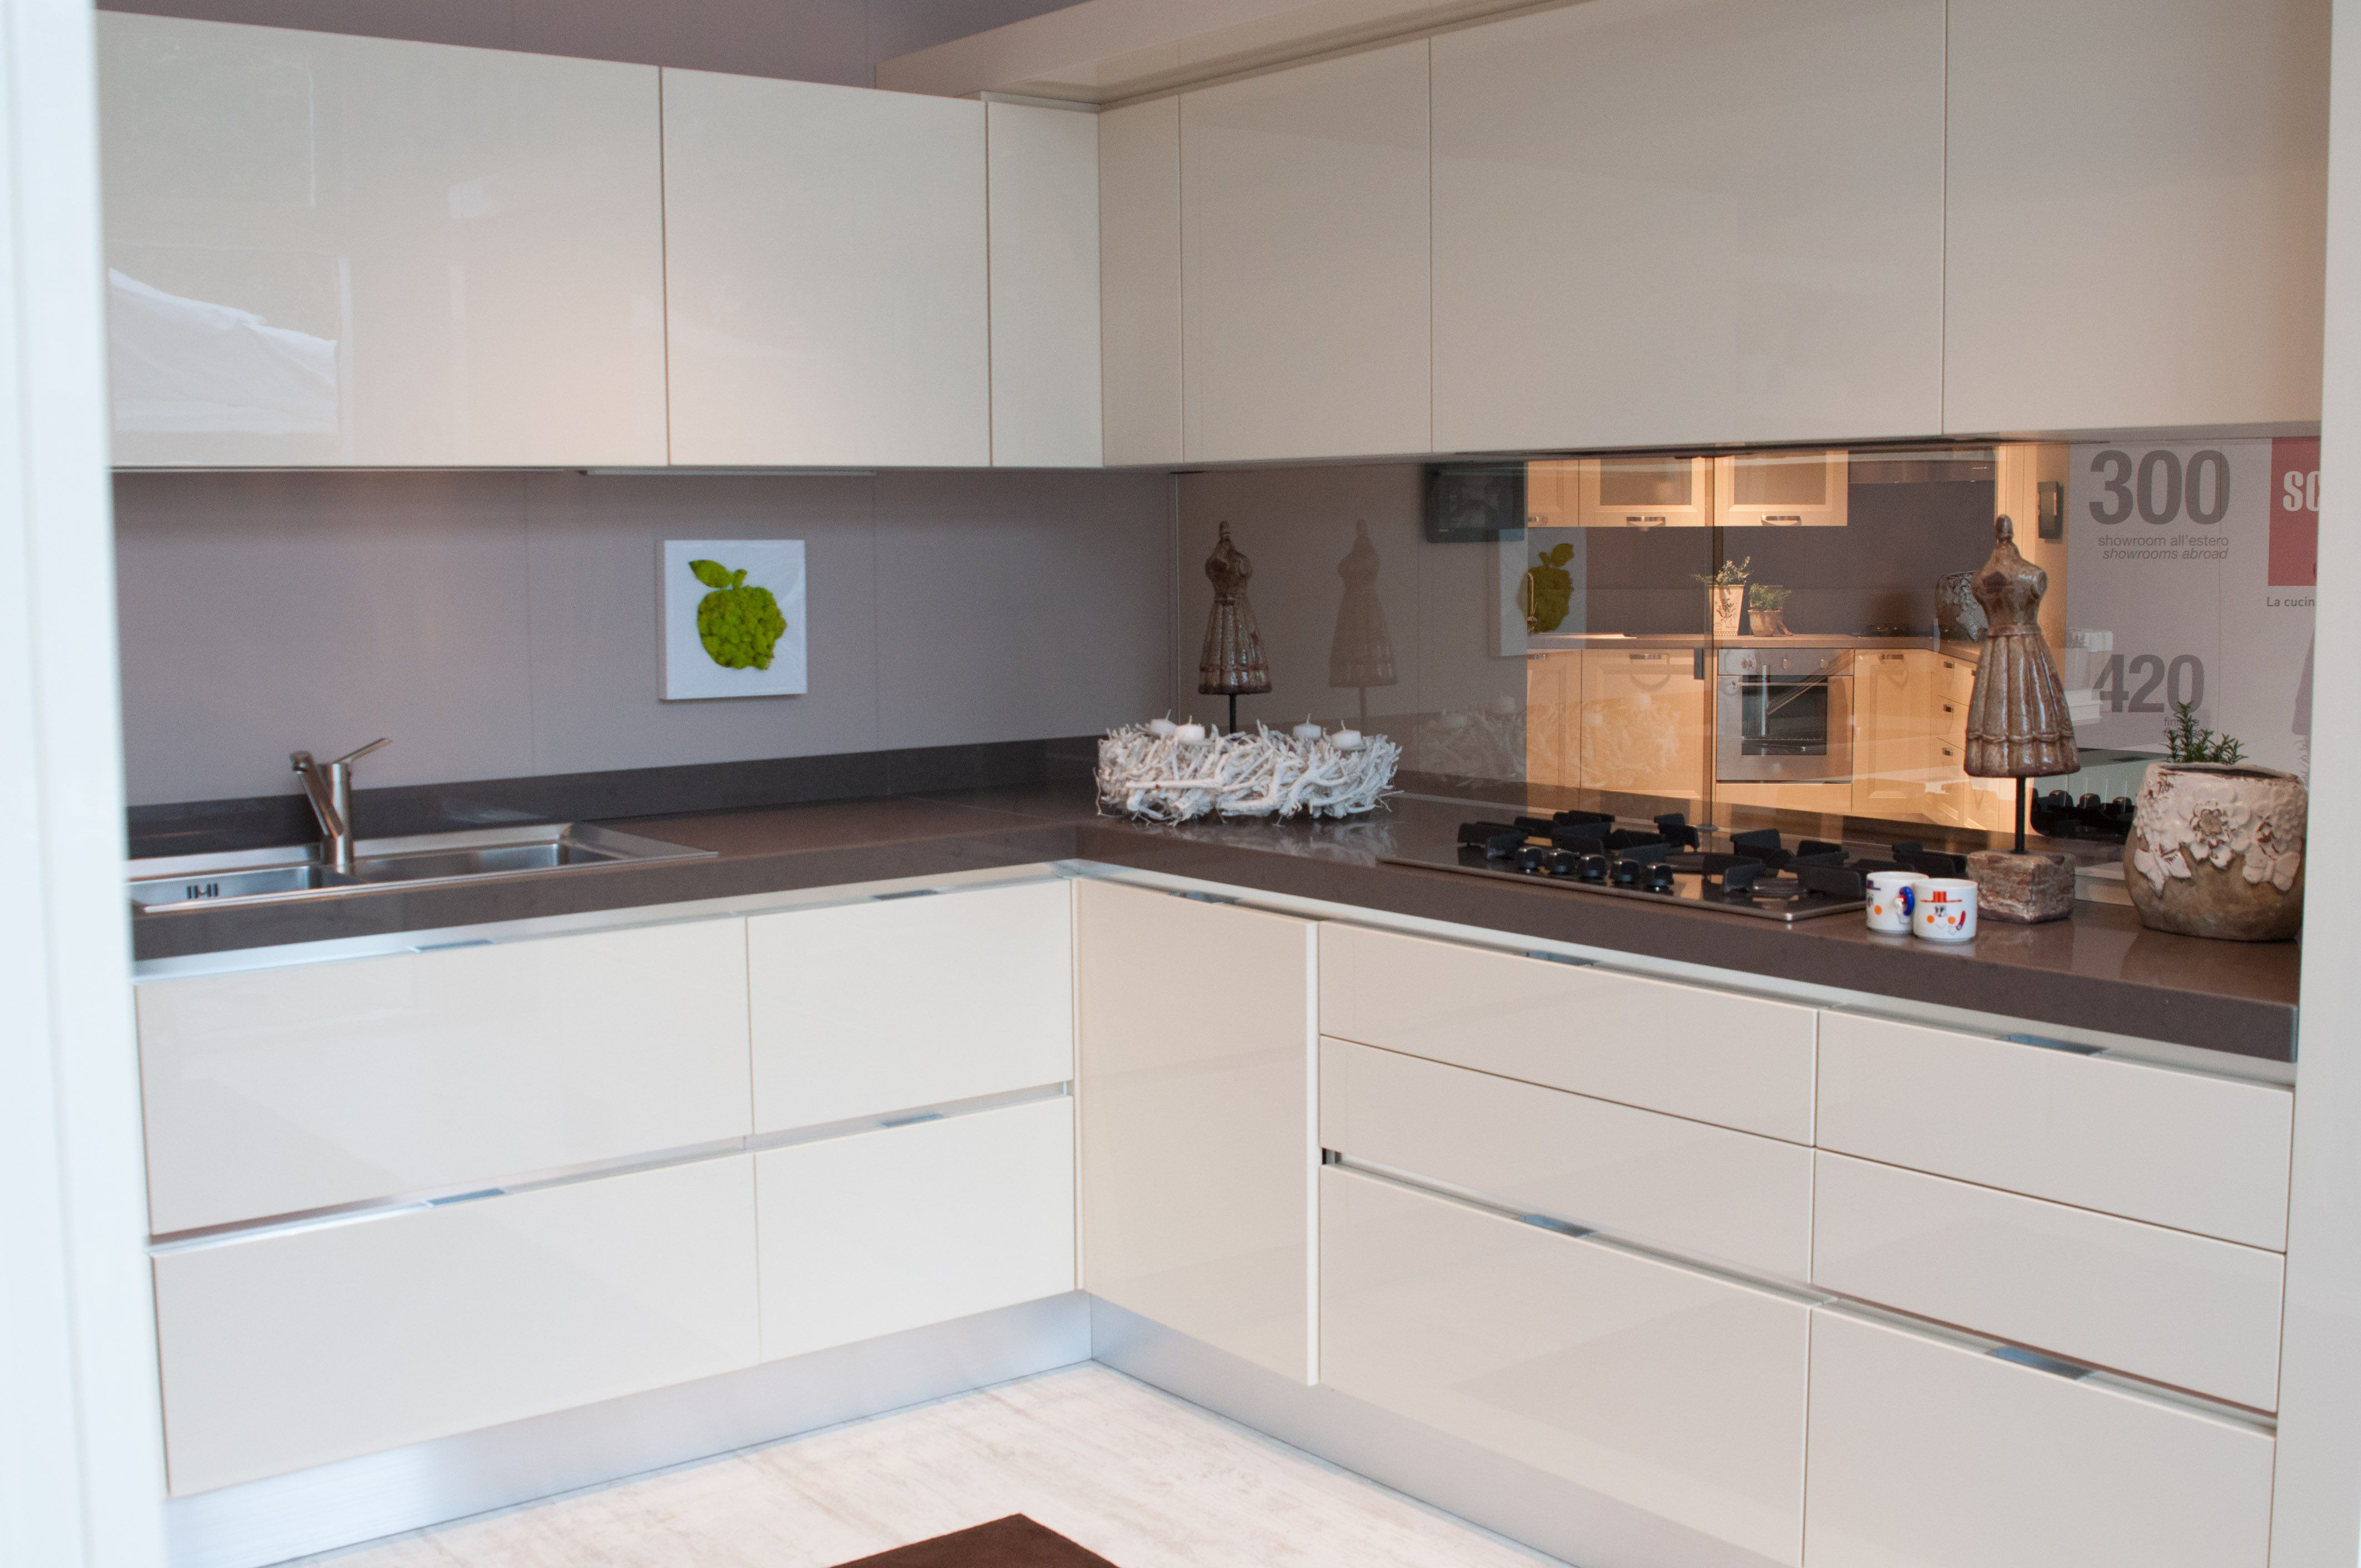 Cucina moderna scavolini composizione ad angolo bianca home pinterest apartment ideas - Scavolini cucina bianca ...